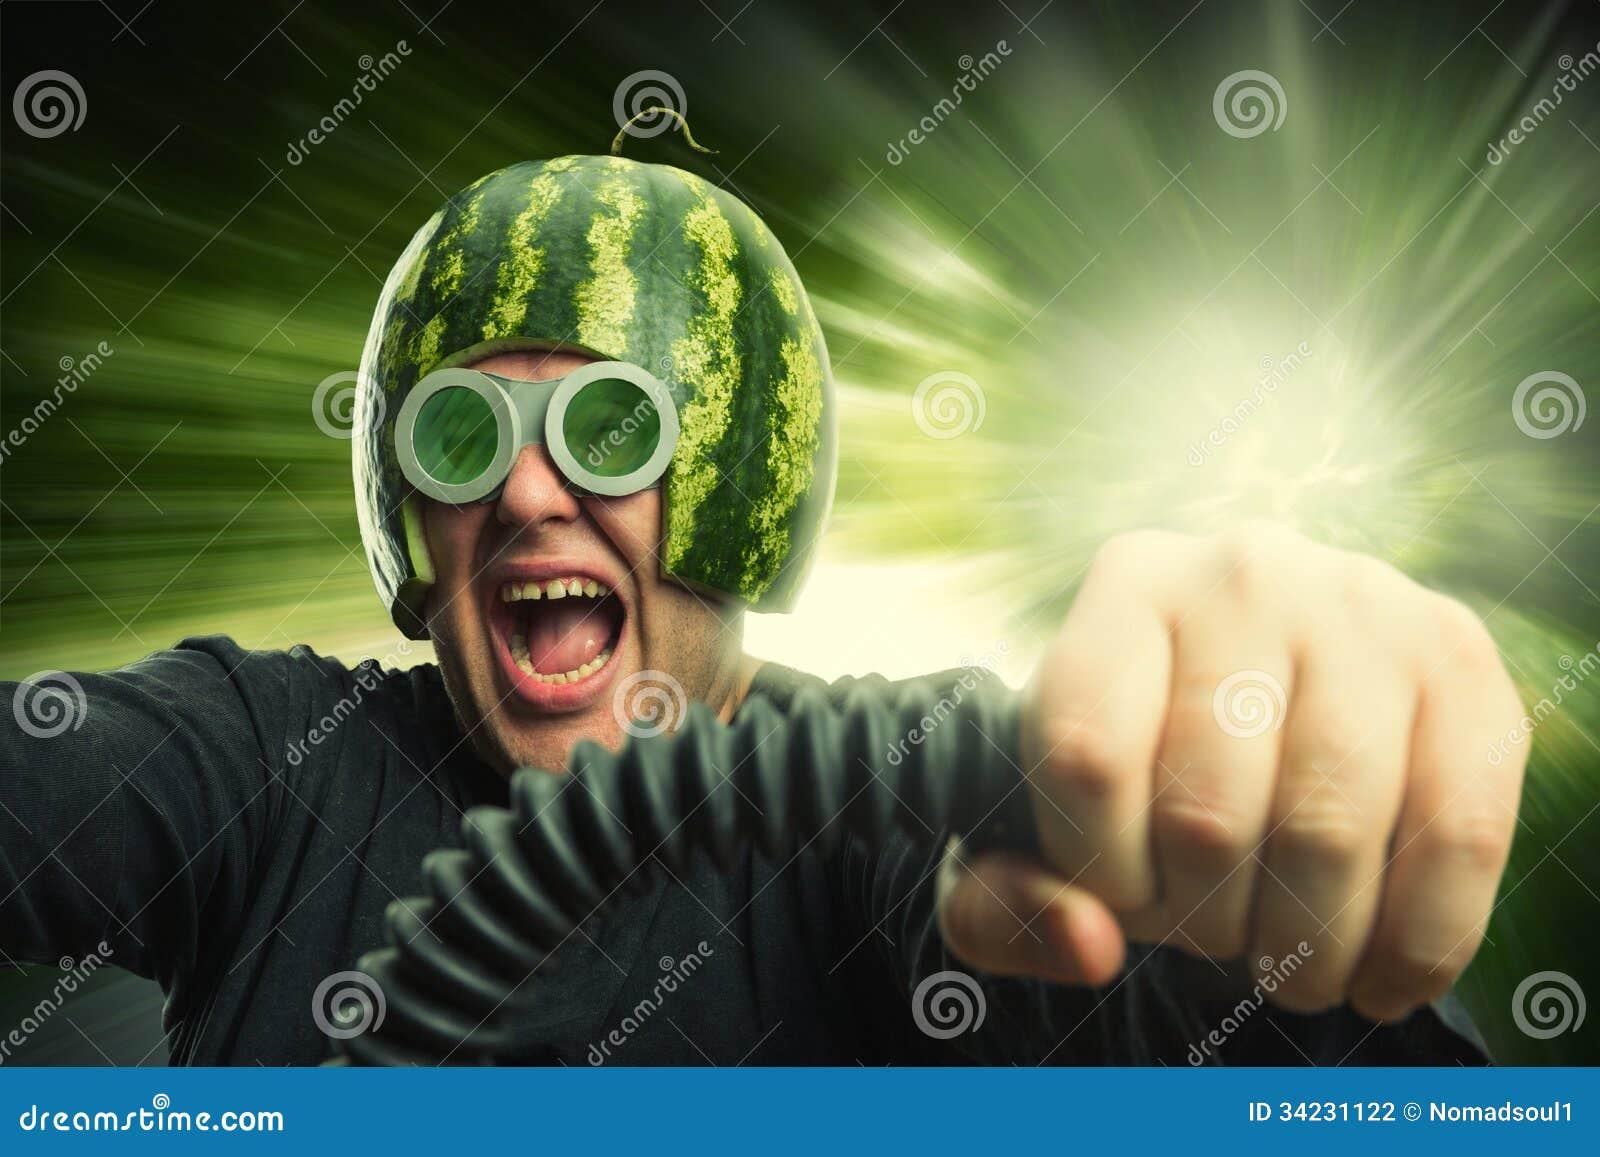 Weird Stock Photos Watermelon 5